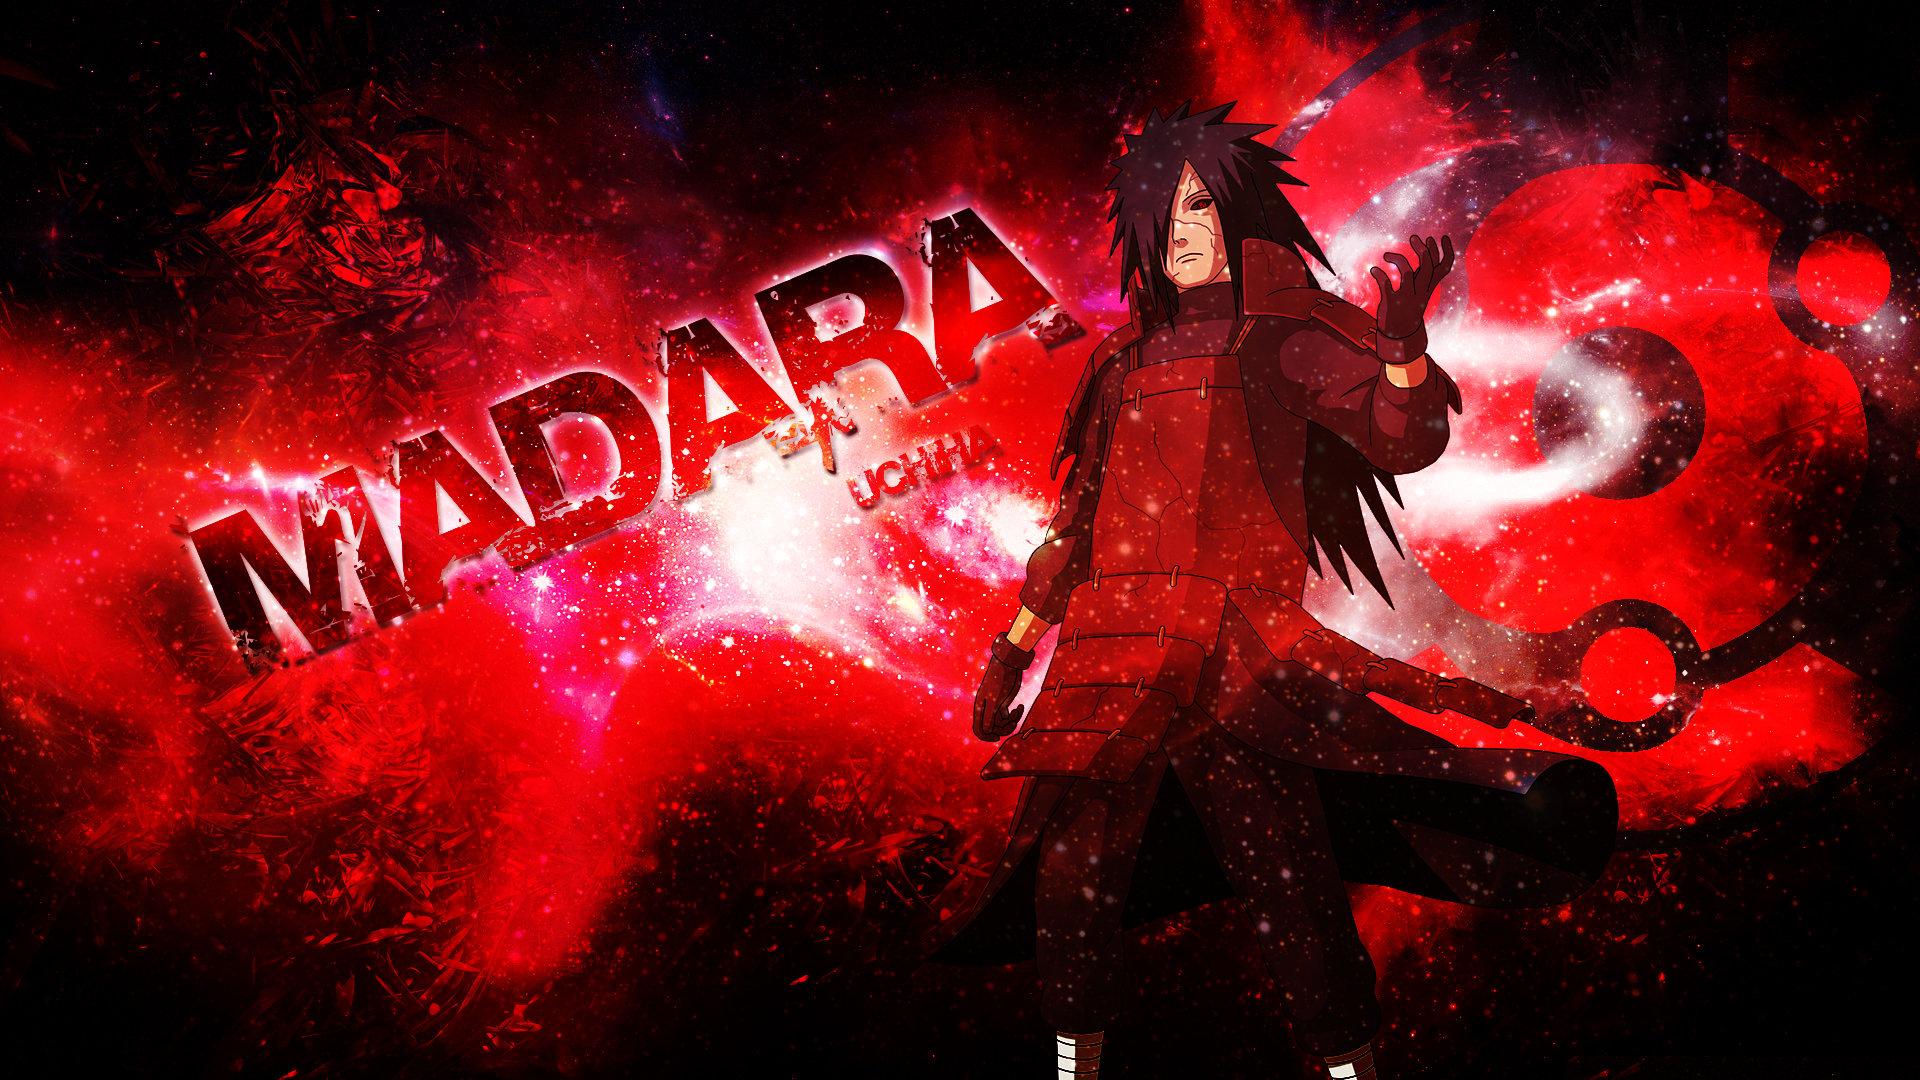 Madara Uchiha Wallpaper 1920x1080: Free Madara Uchiha High Quality Background ID:396053 For